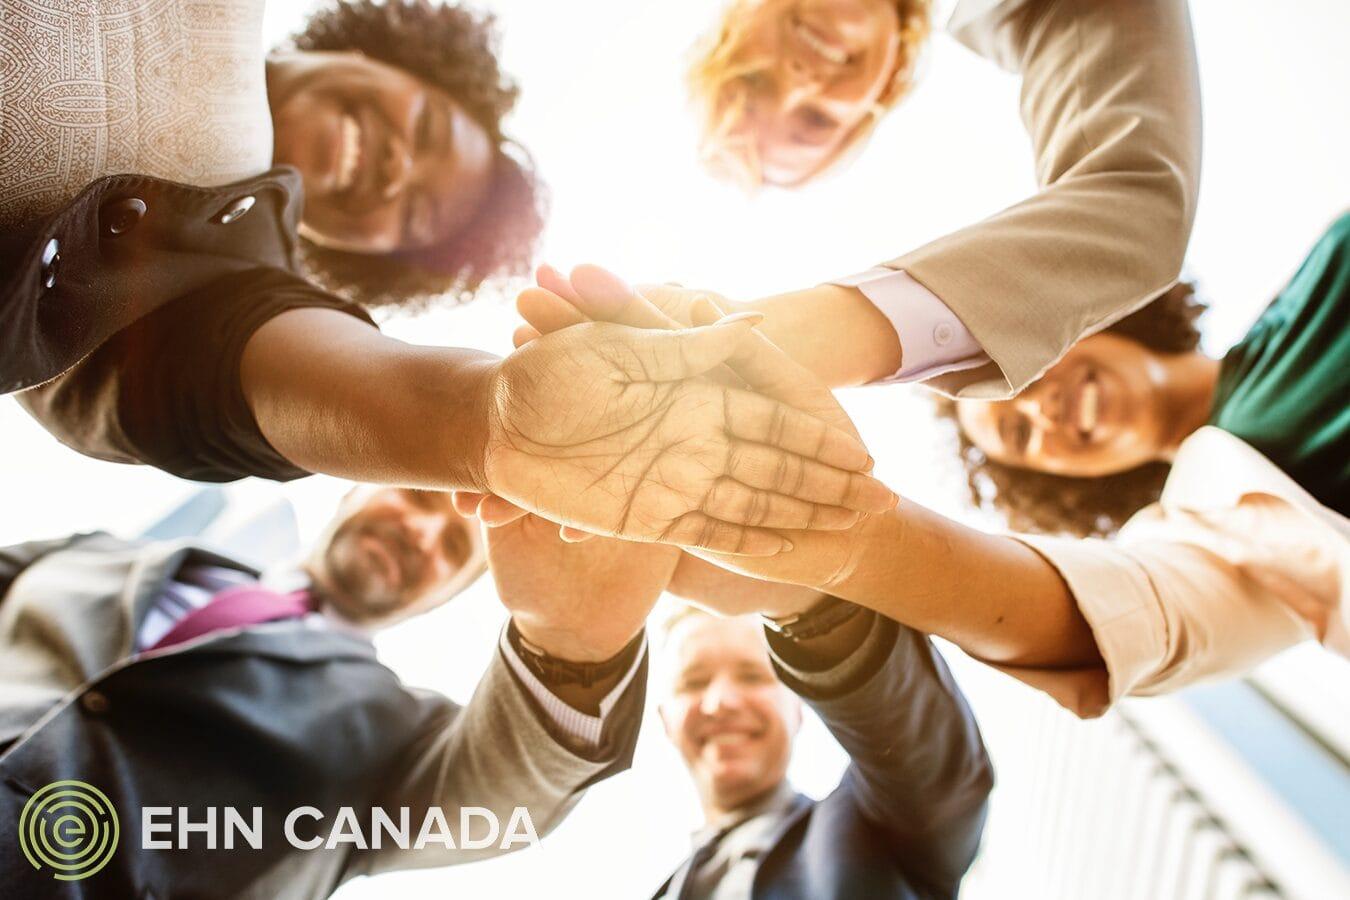 Graduating from Drug Rehab EHN Canada Get Treatment